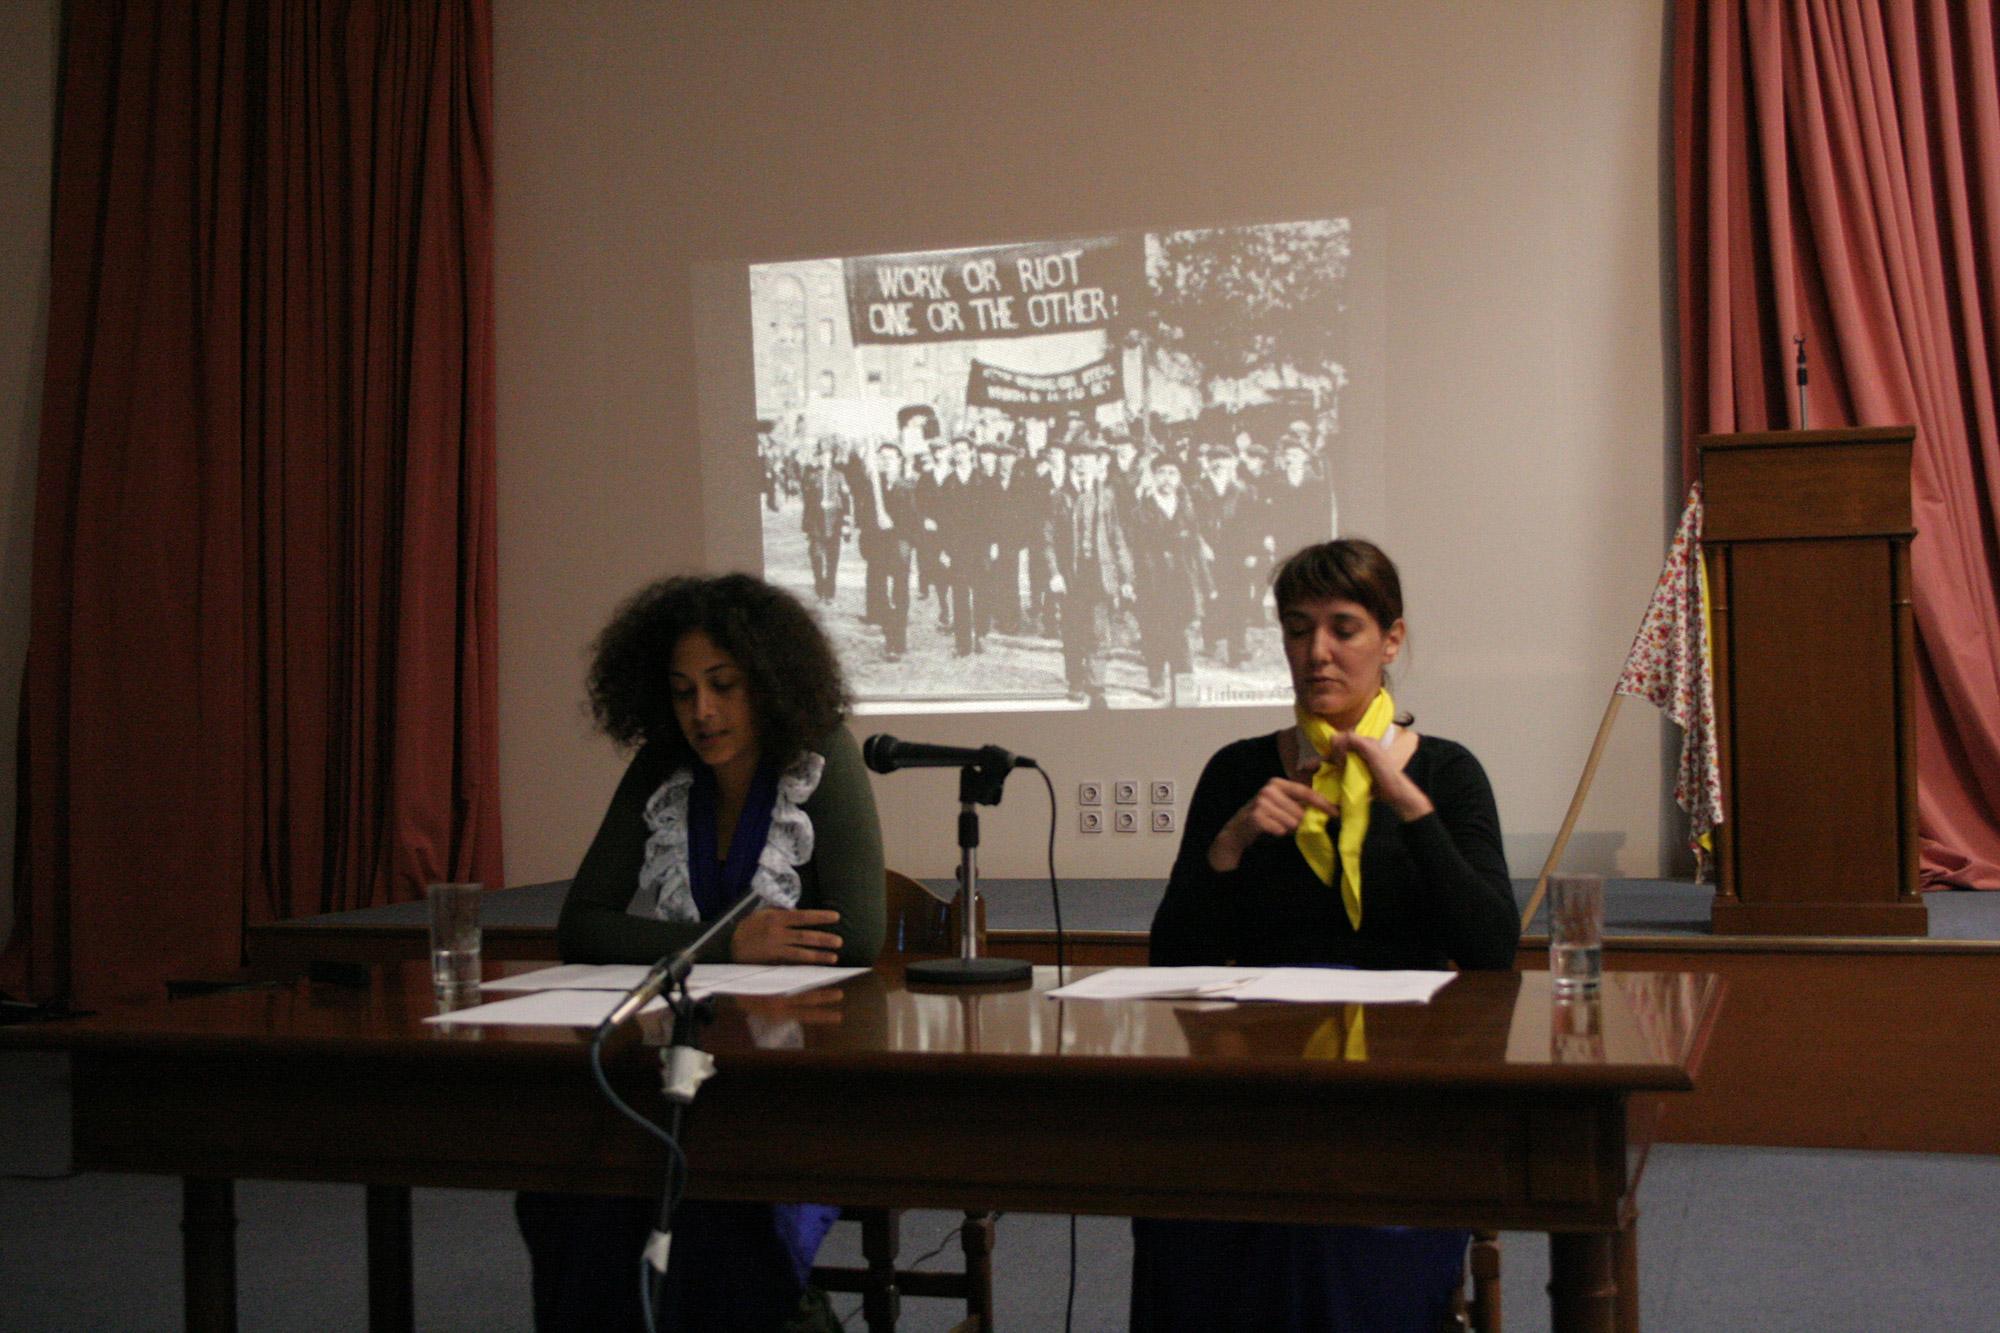 Yota Ioannidou and Teresa Maria Diaz Nerio, Aula Intergalactica, 2011